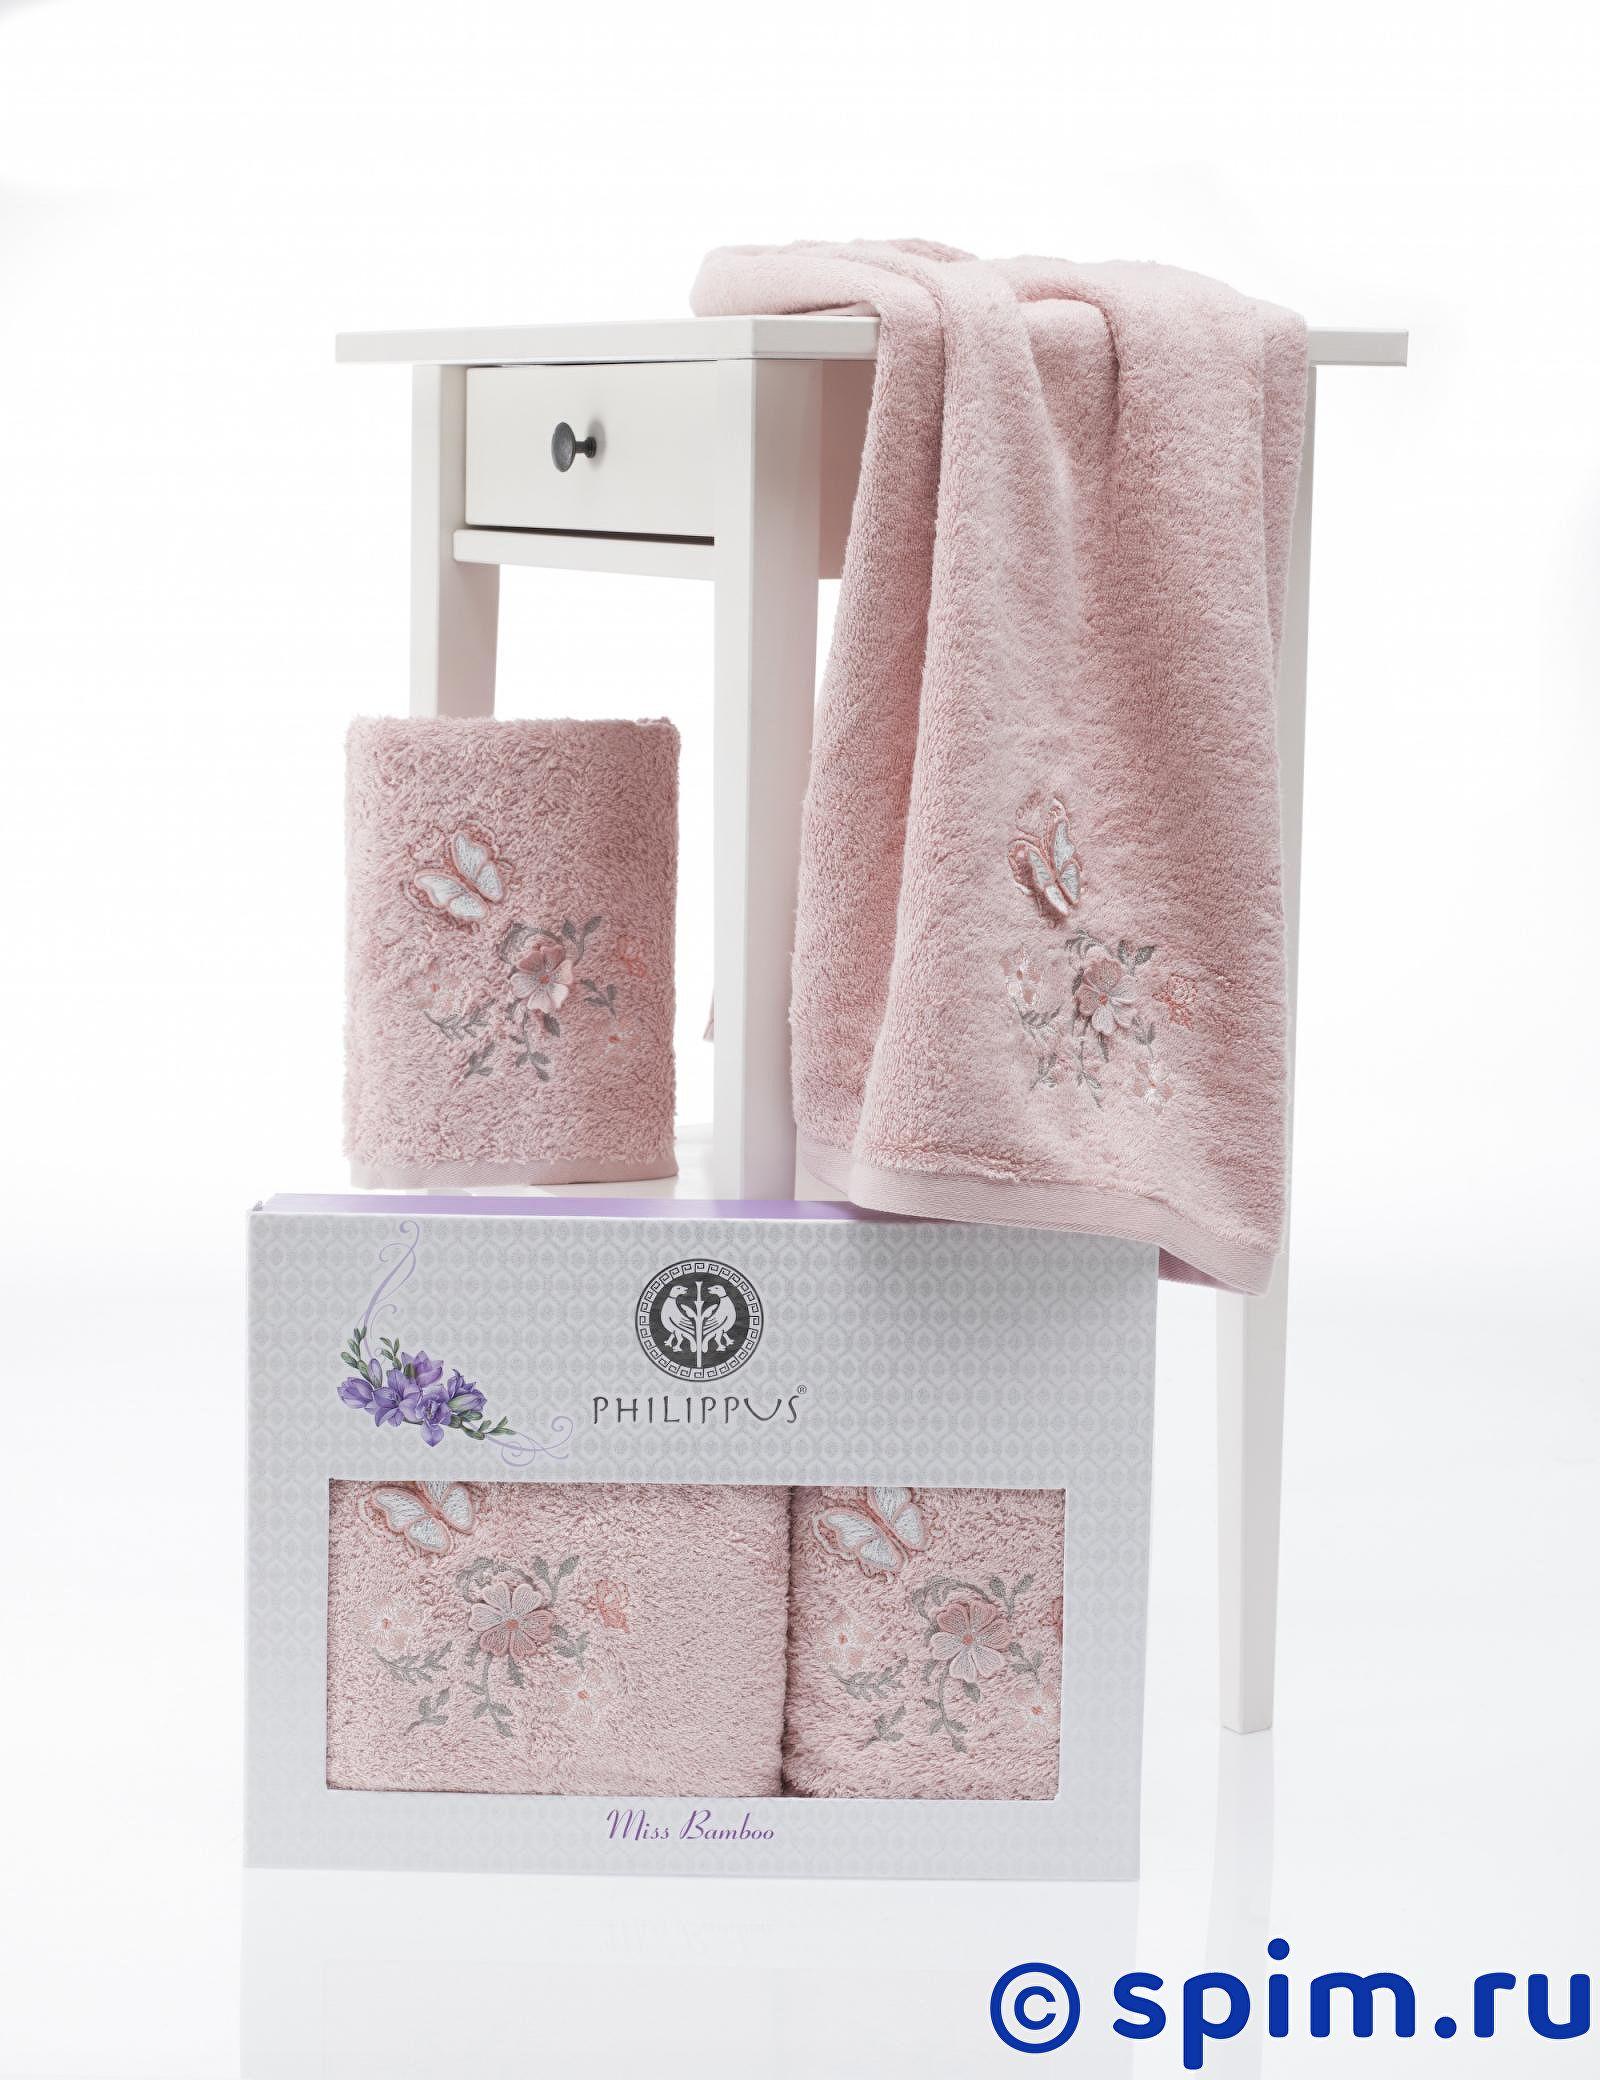 Комплект из 2-х полотенец Philippus Saikusa полотенца philippus полотенце laura 50х90 см 6 шт